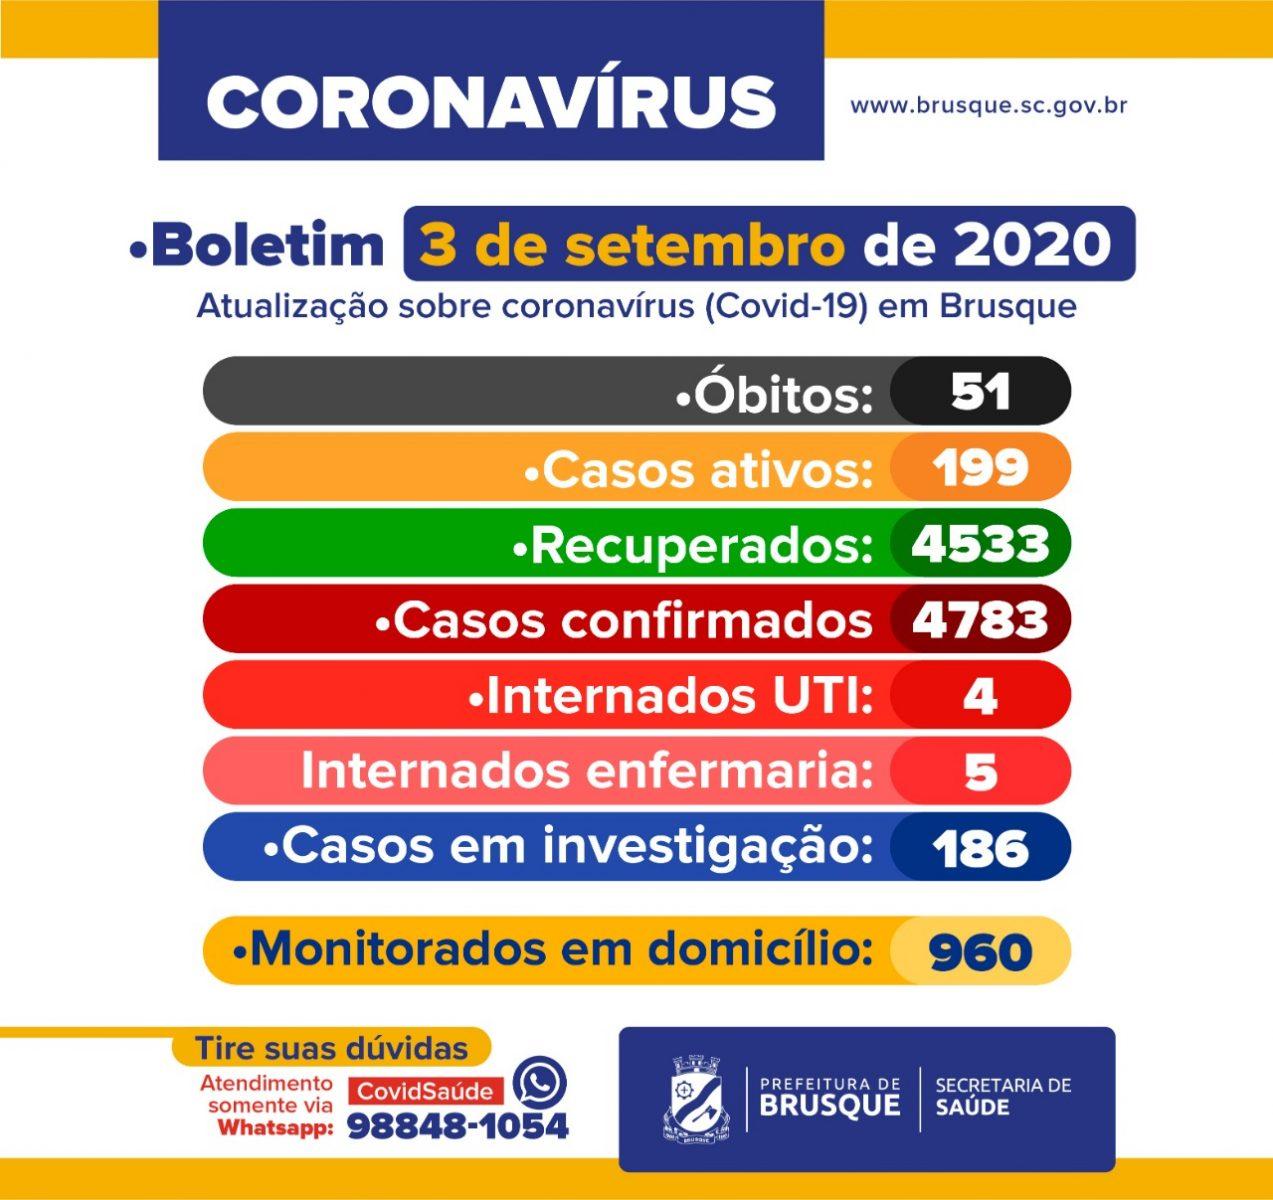 COVID-19: Boletim epidemiológico desta quinta-feira, 3 de setembro